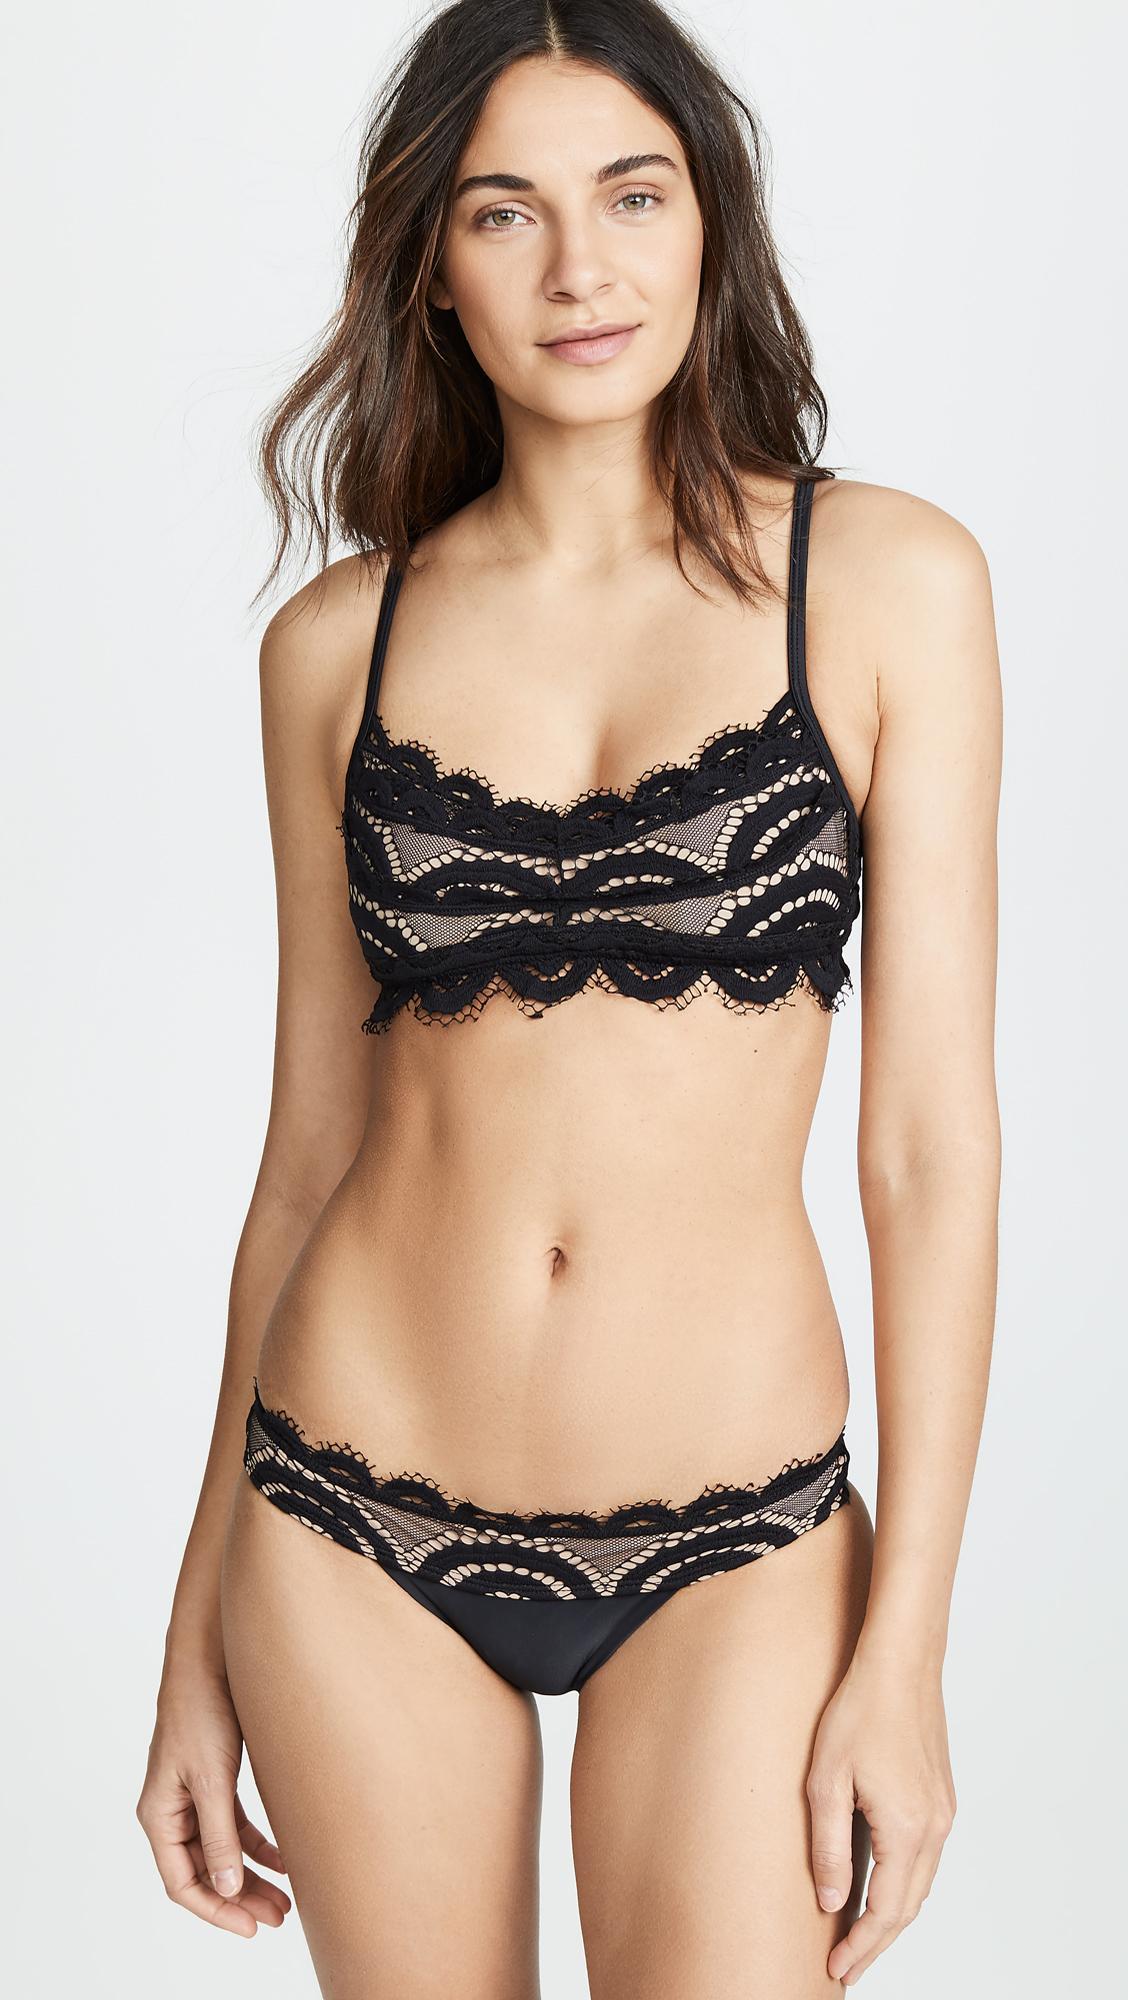 bf9ad7ec1f Pilyq. Women s Lace Bralette Bikini Top